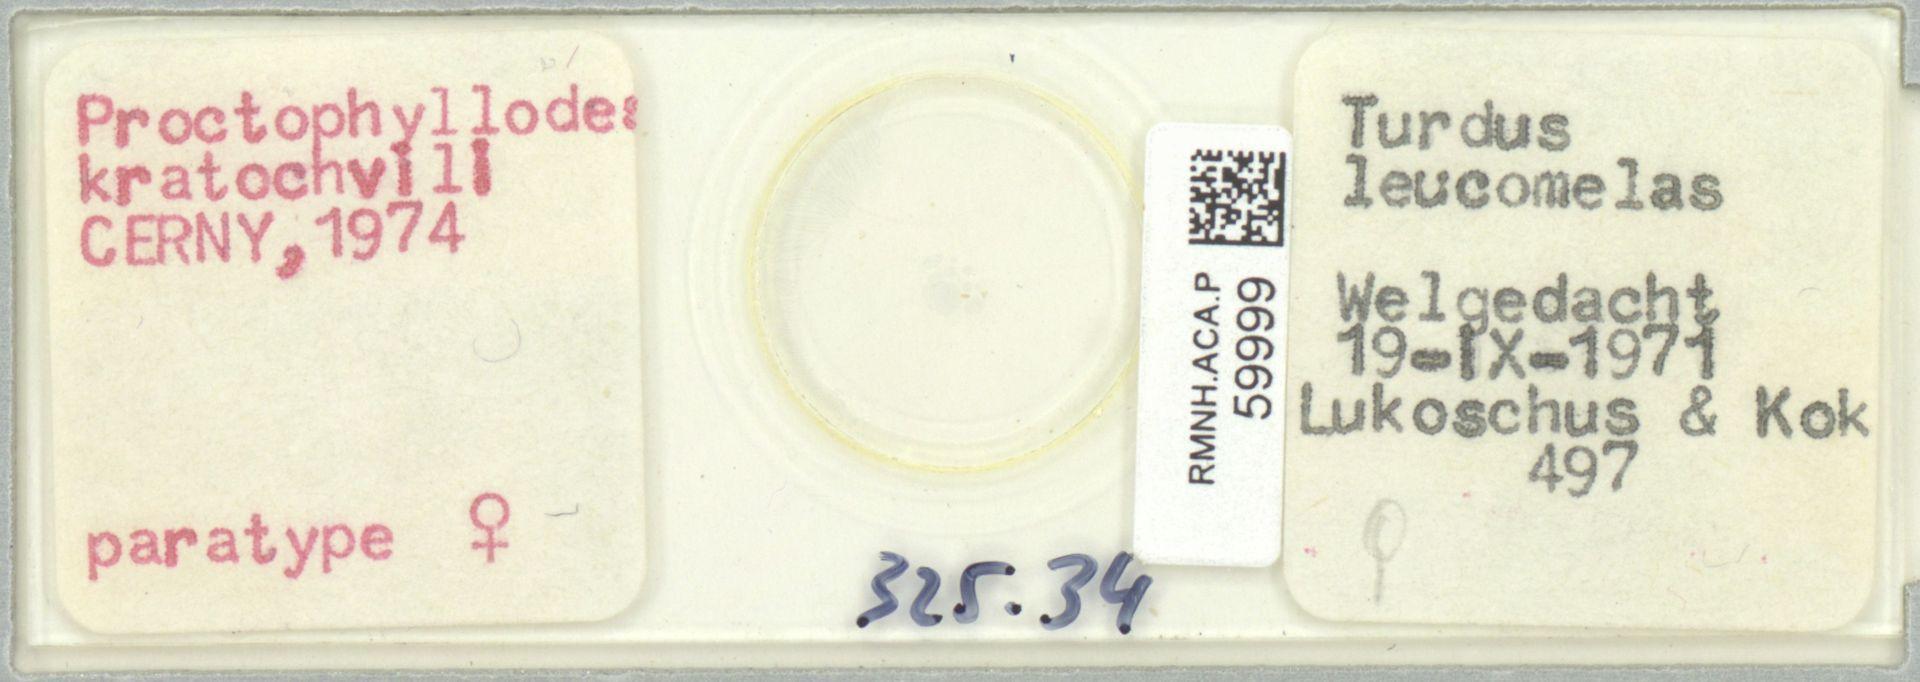 RMNH.ACA.P.59999   Proctophyllodes kratochvili Cerny, 1974